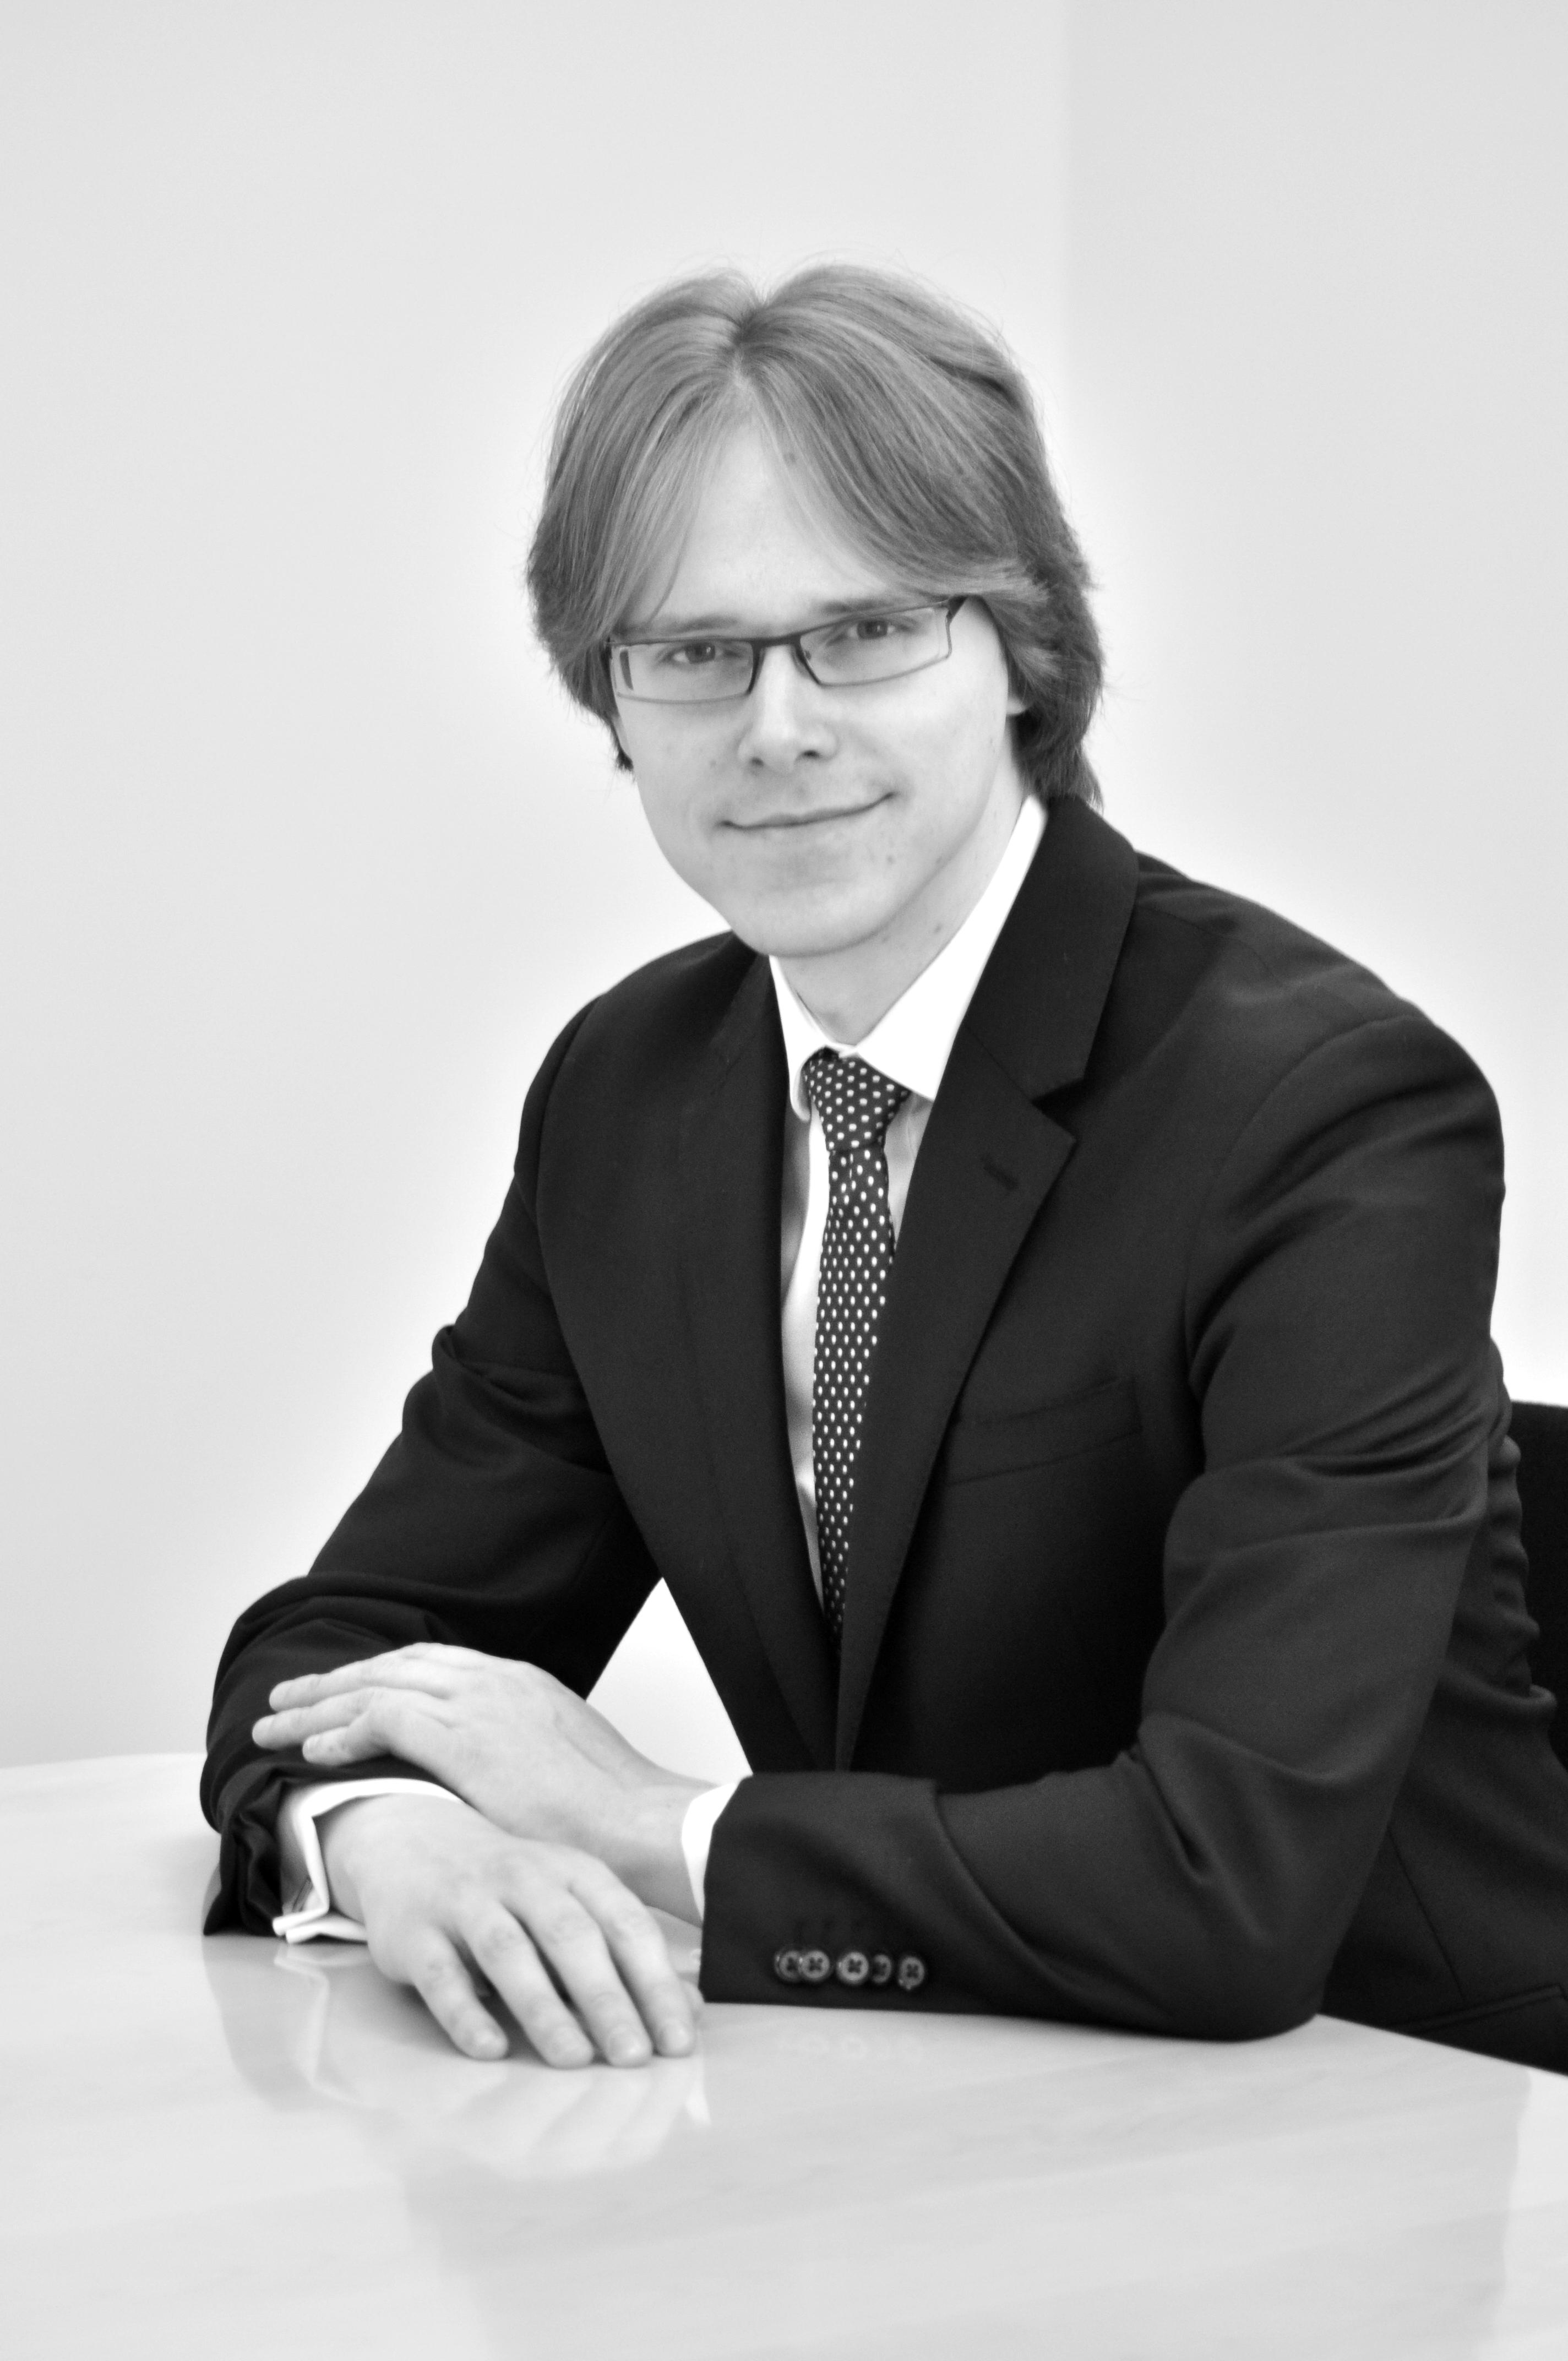 Petr Hanka